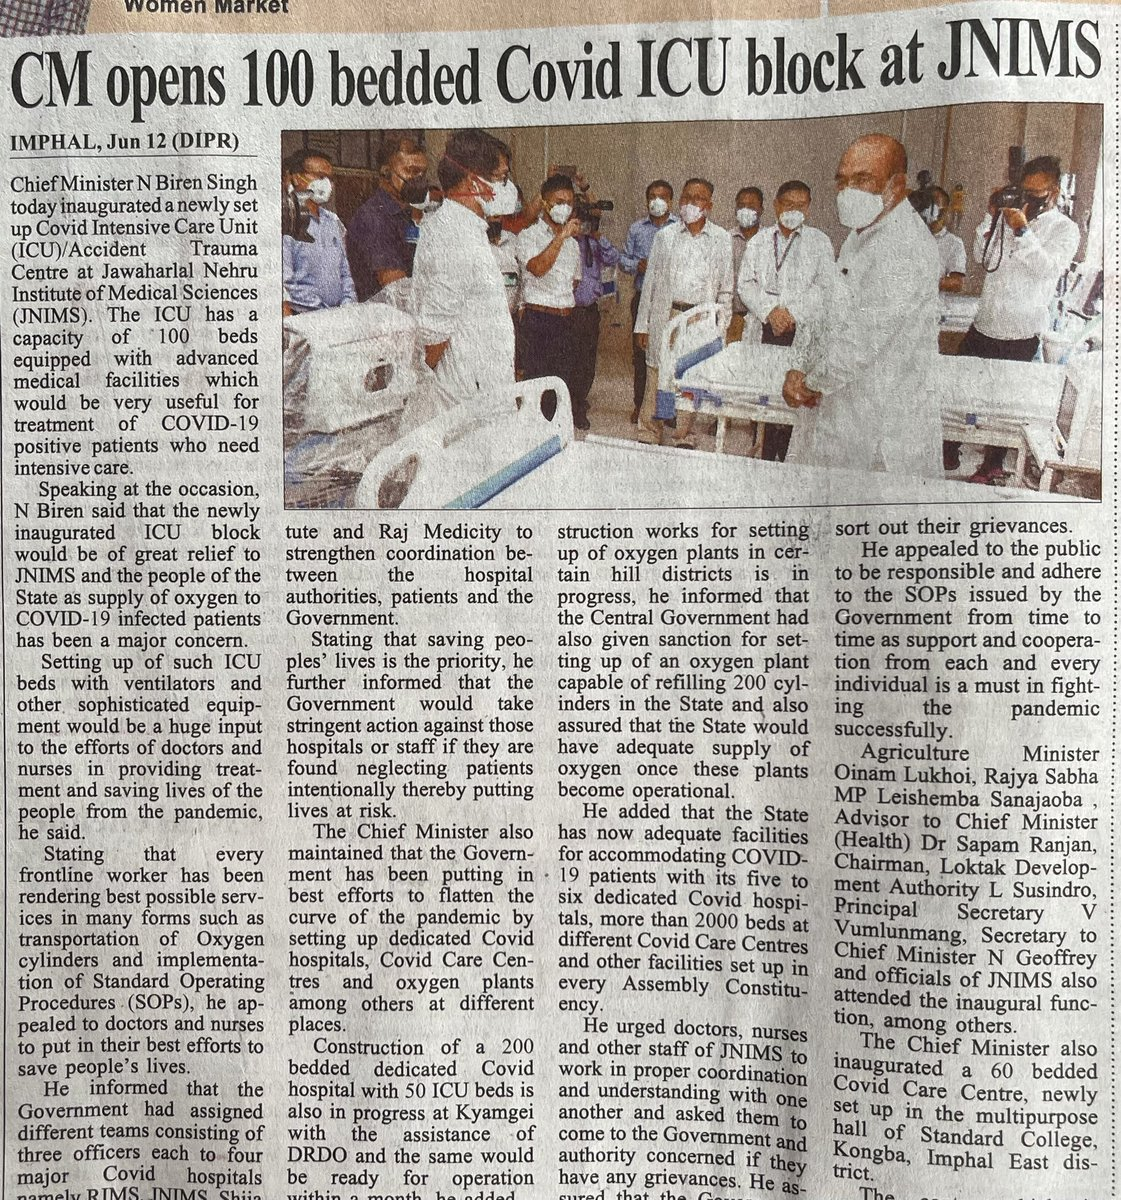 Hon'ble CM @NBirenSingh ji opens 100 bedded #COVID19 Intensive Care Unit block at Imphal https://t.co/fK4hHjlJqs will give a most advance medical facilities to the #poor patients. Jai hind @narendramodi @JPNadda @sambitswaraj @VungzaginValte @rsapam @imosingh https://t.co/PghsuBVYj5